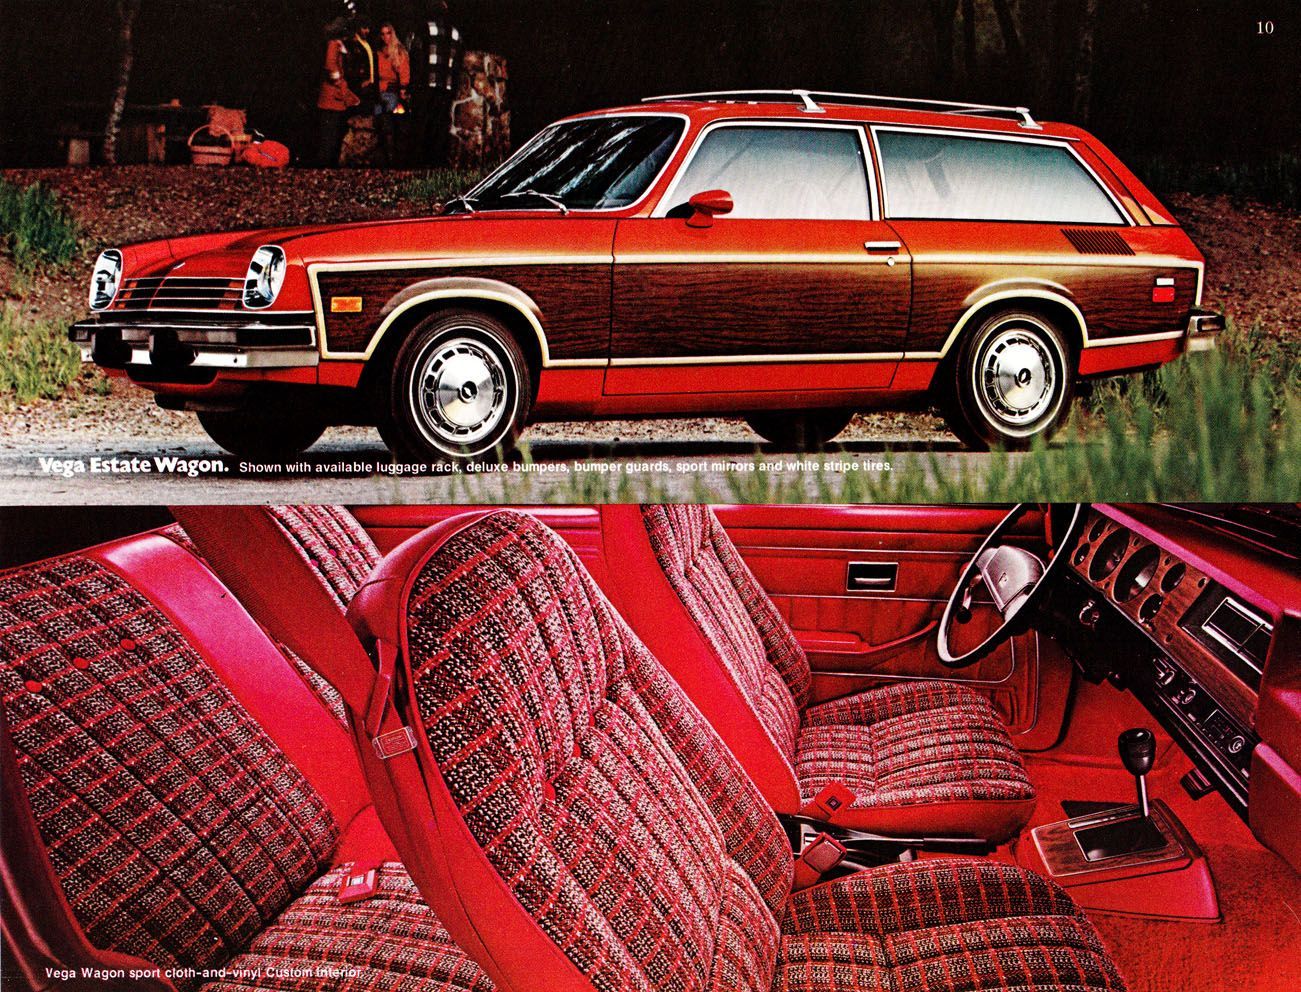 All Chevy 74 chevy vega gt : 1976 Chevrolet Vega Estate Wagon   print   Pinterest   Chevrolet ...